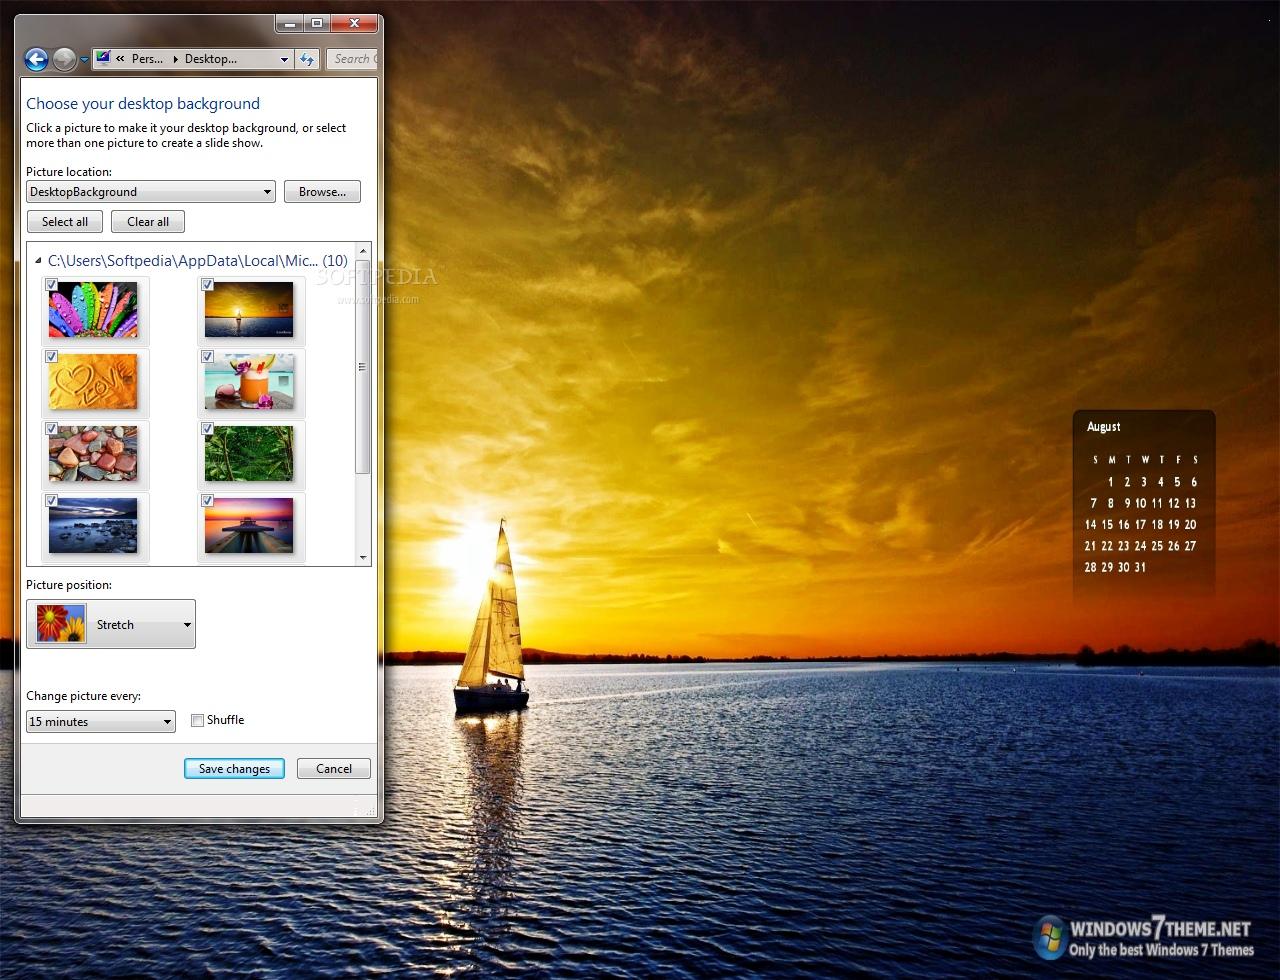 August 2011: Download August 2011 Calendar Windows 7 Theme 1.0